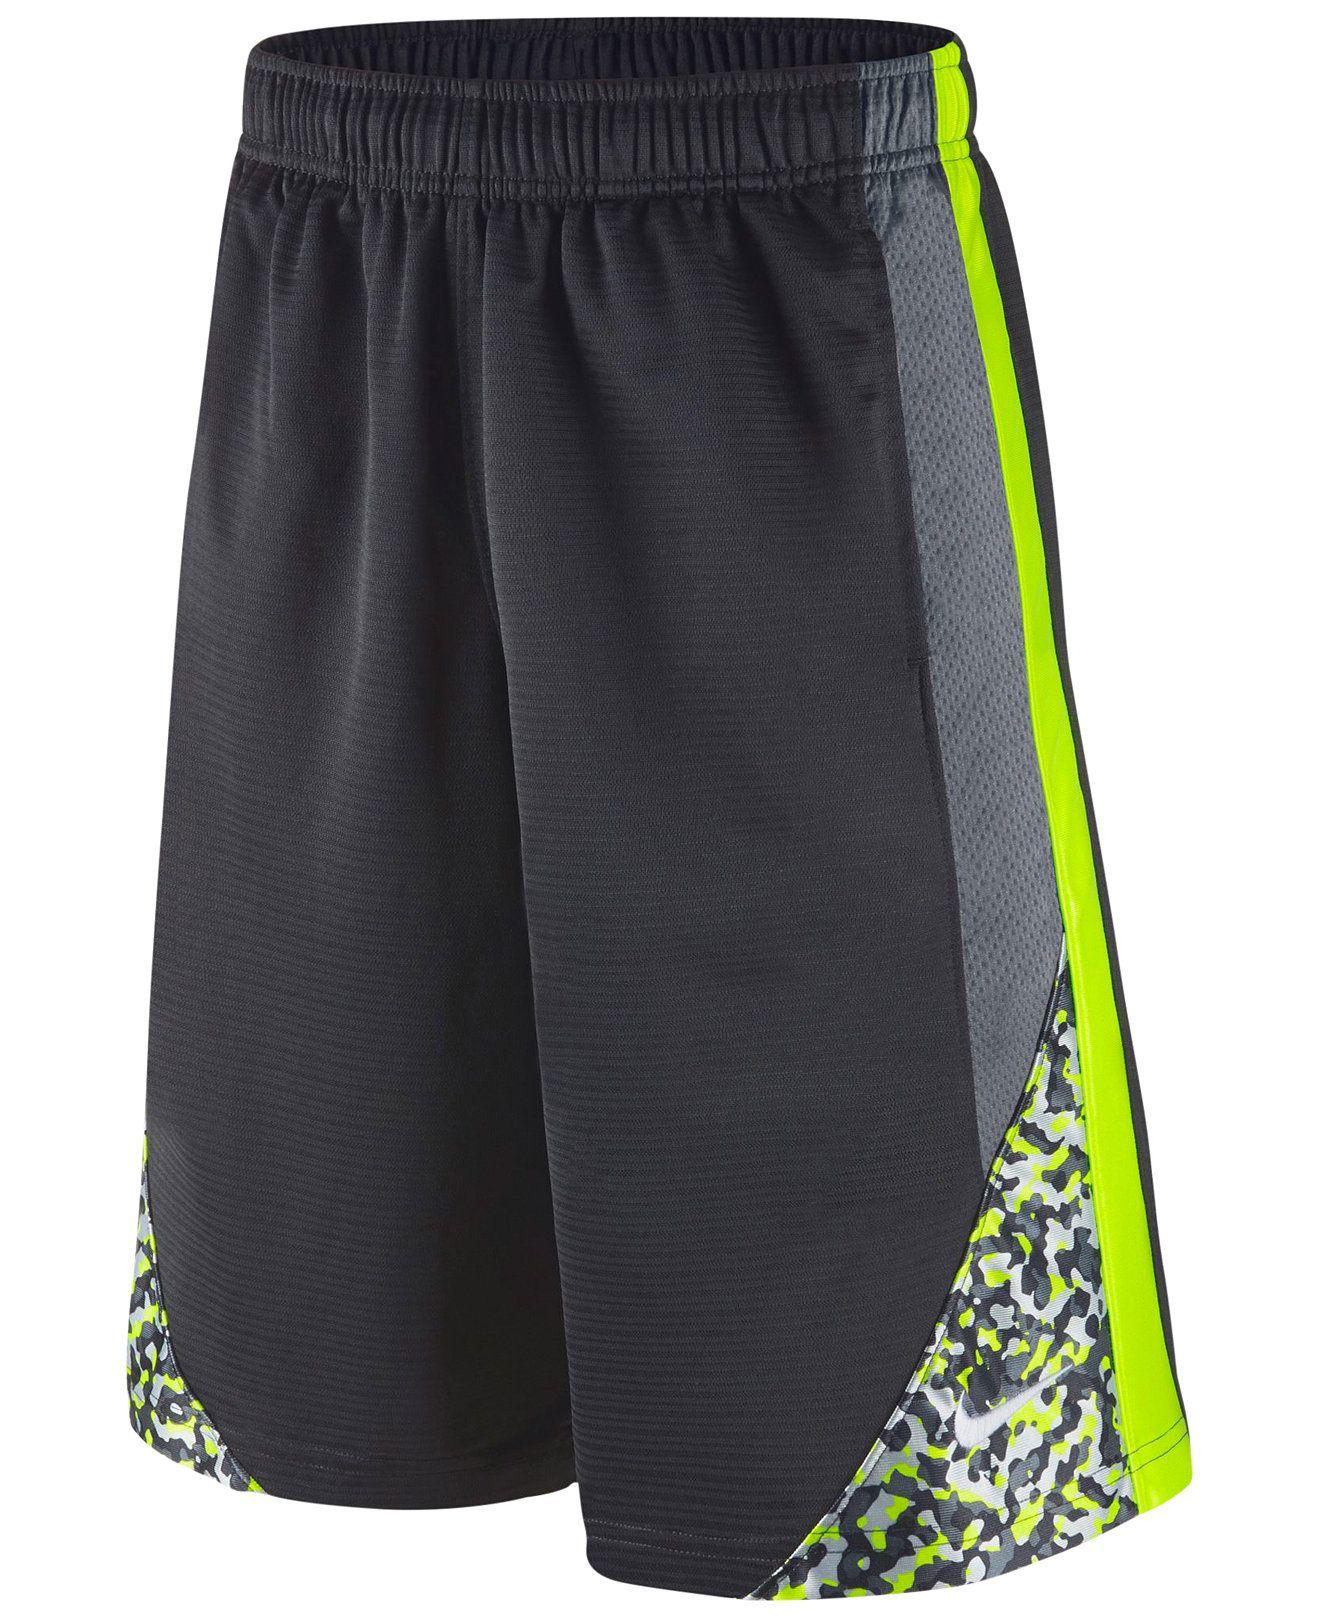 Nike Boys' Avalanche GFX 2.0 Shorts - Kids & Baby - Macy's